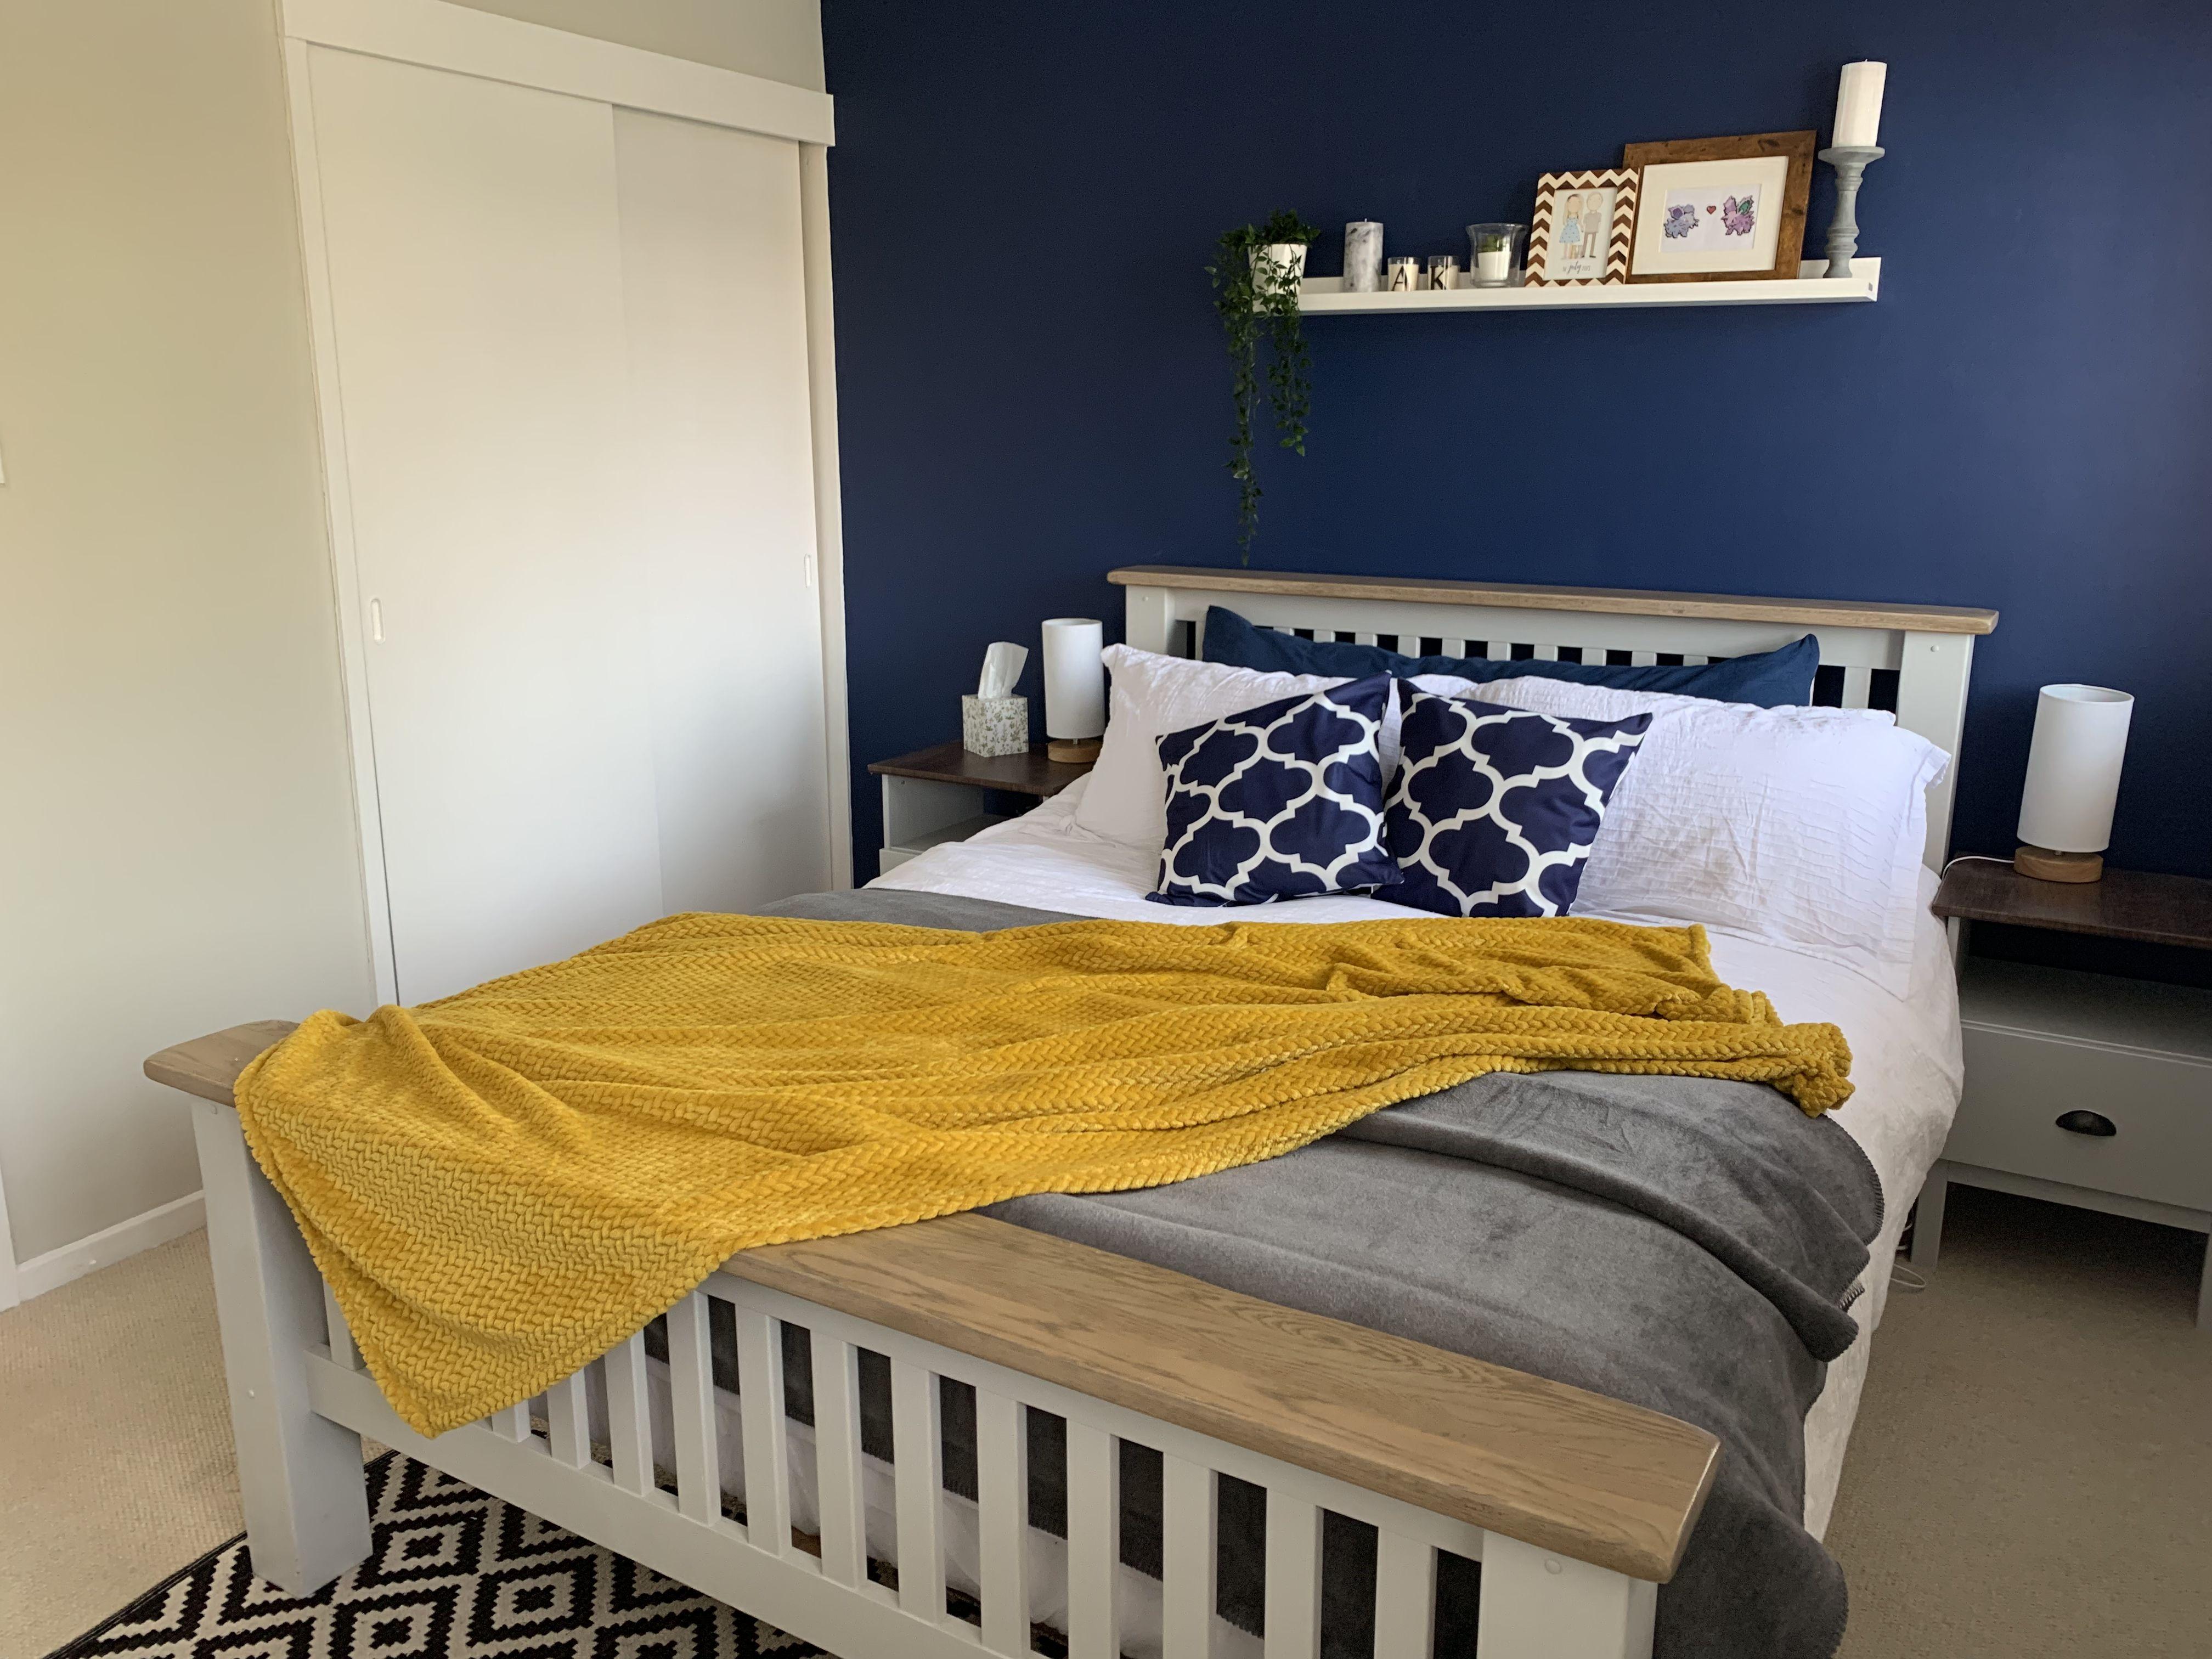 Pin By Holly Brydon On Home Decor Grey Bedroom Decor Mustard Bedroom Blue Master Bedroom